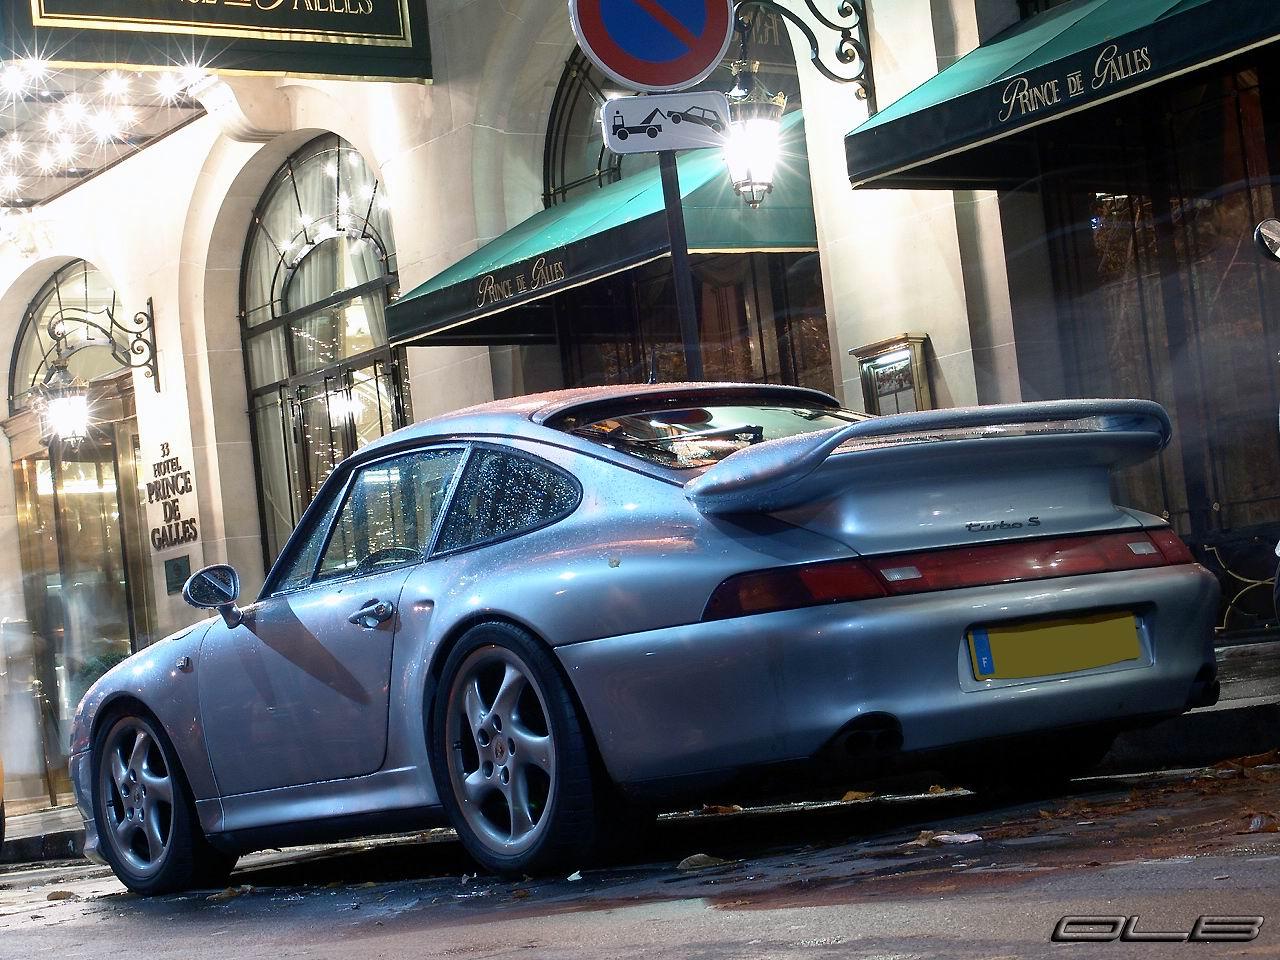 jour : Porsche 993 Turbo S